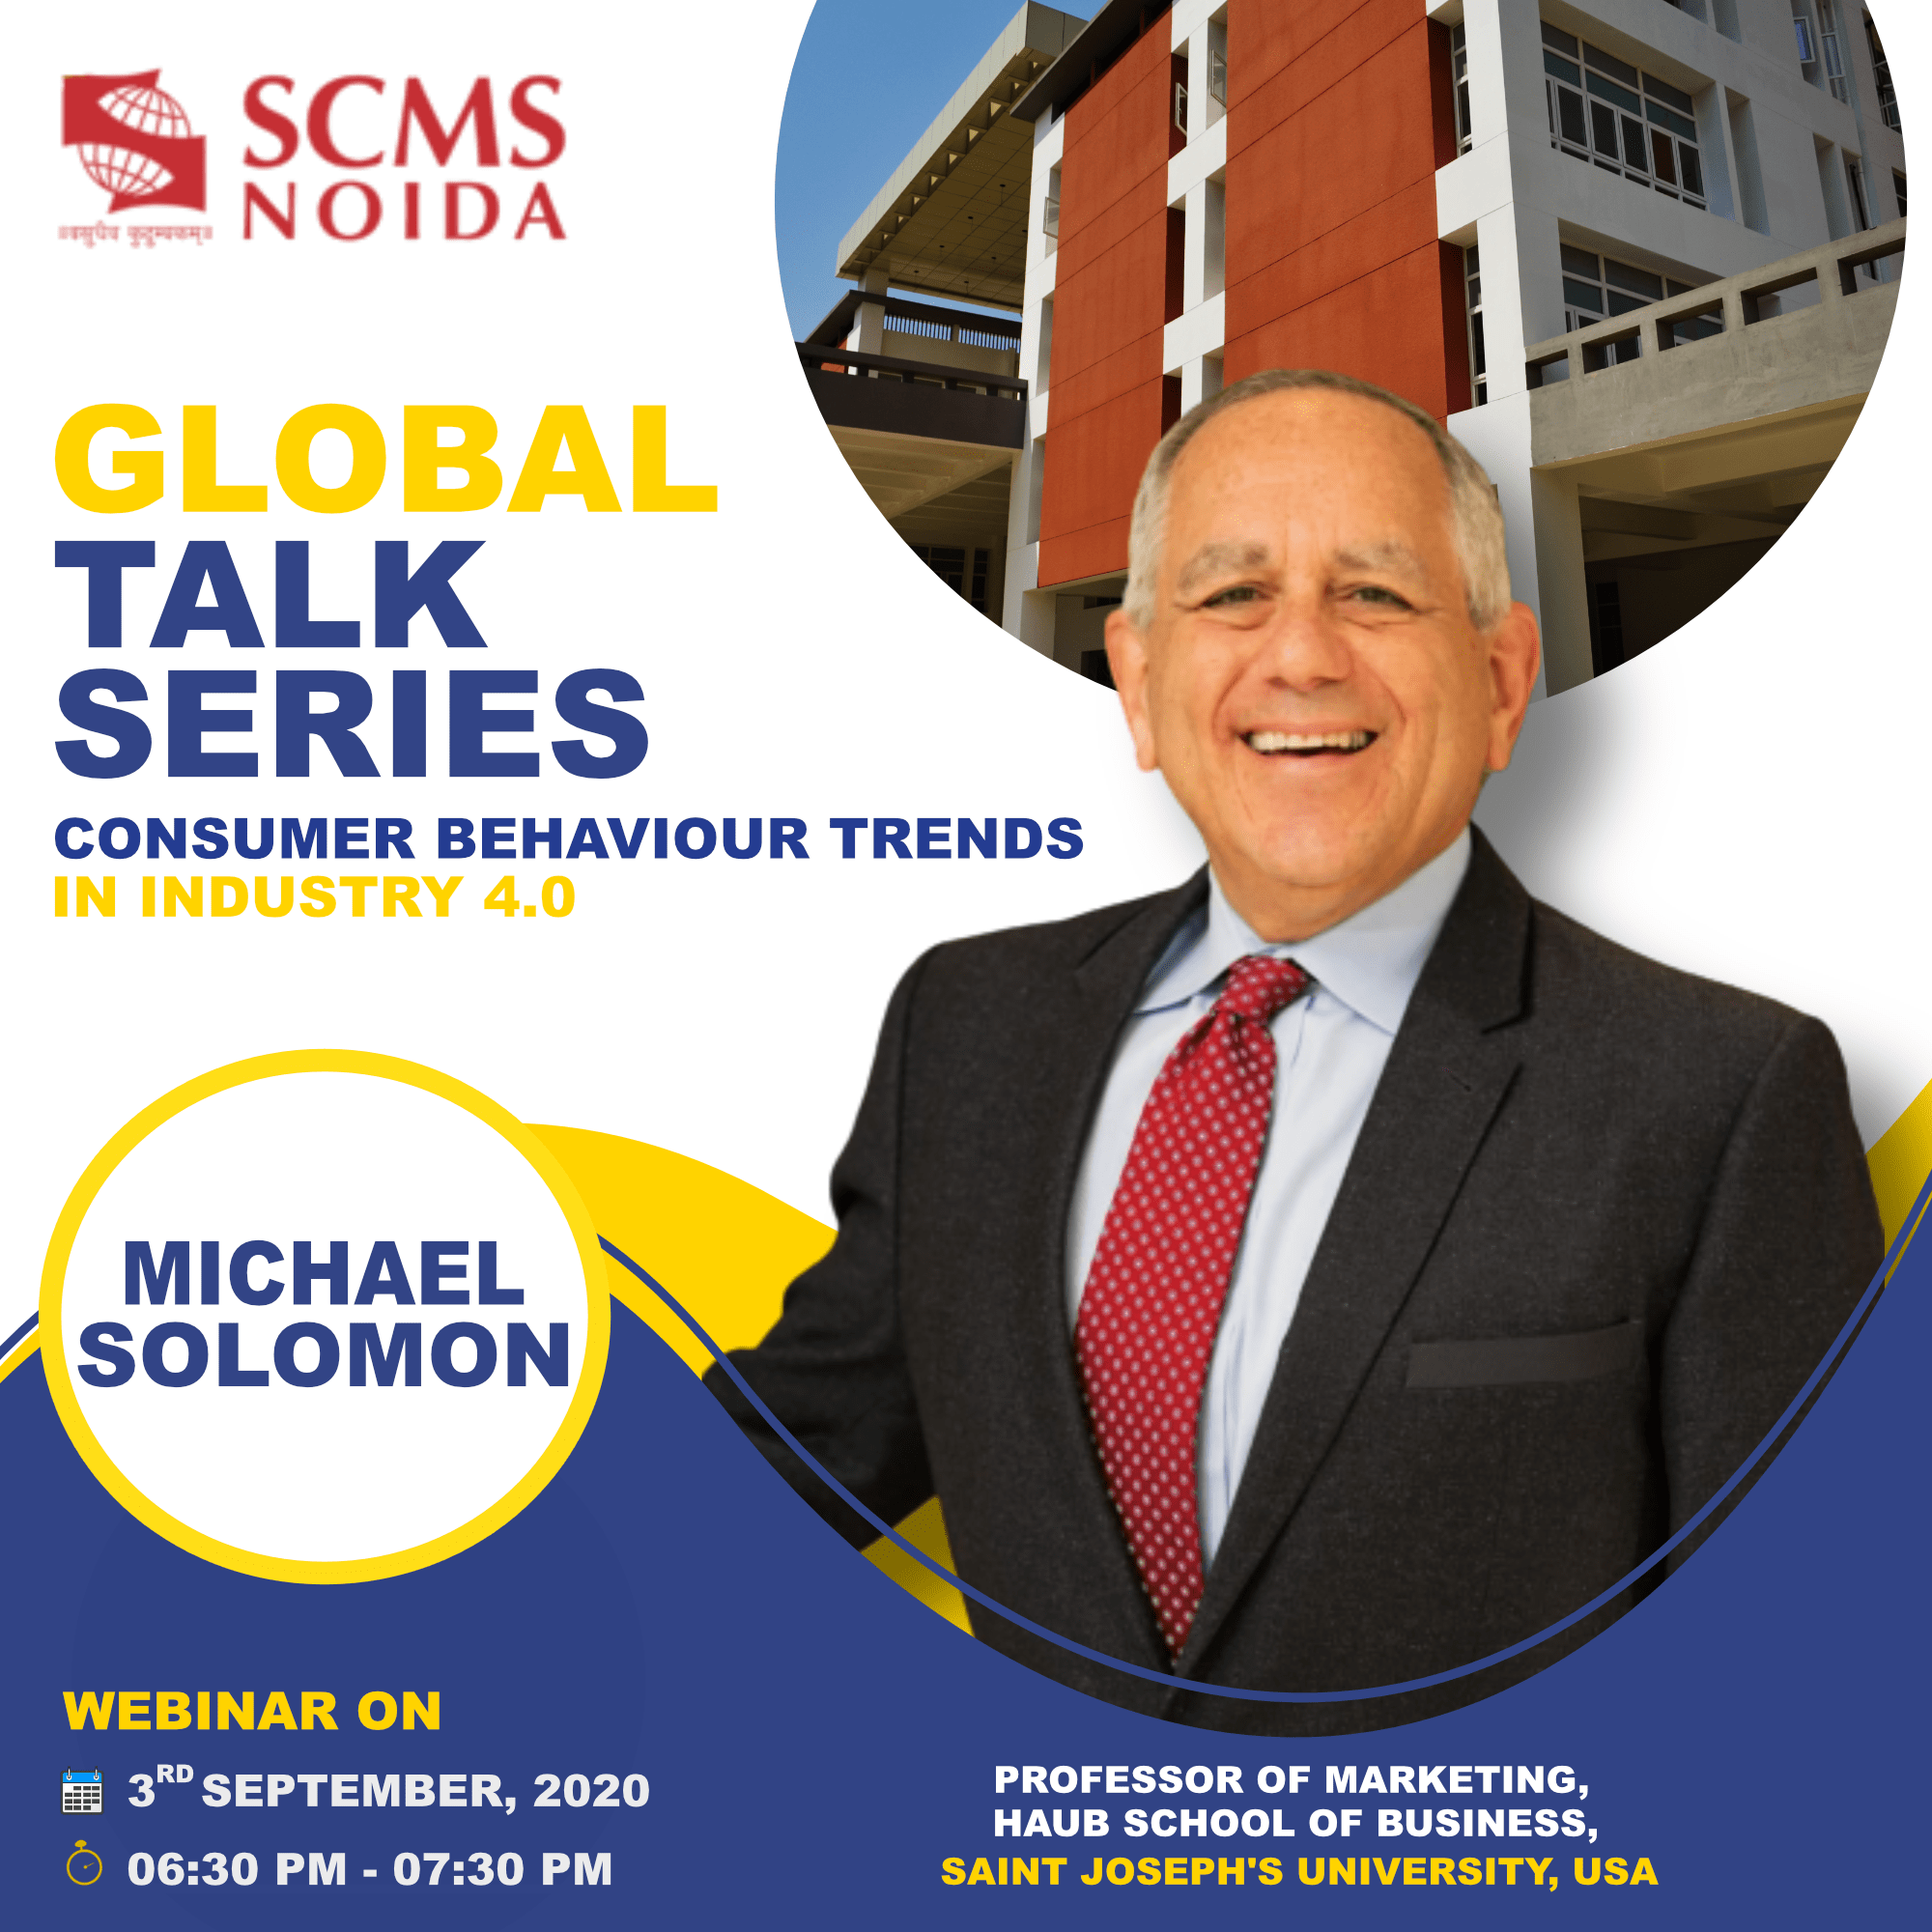 Michael Solomon at SCMS NOIDA